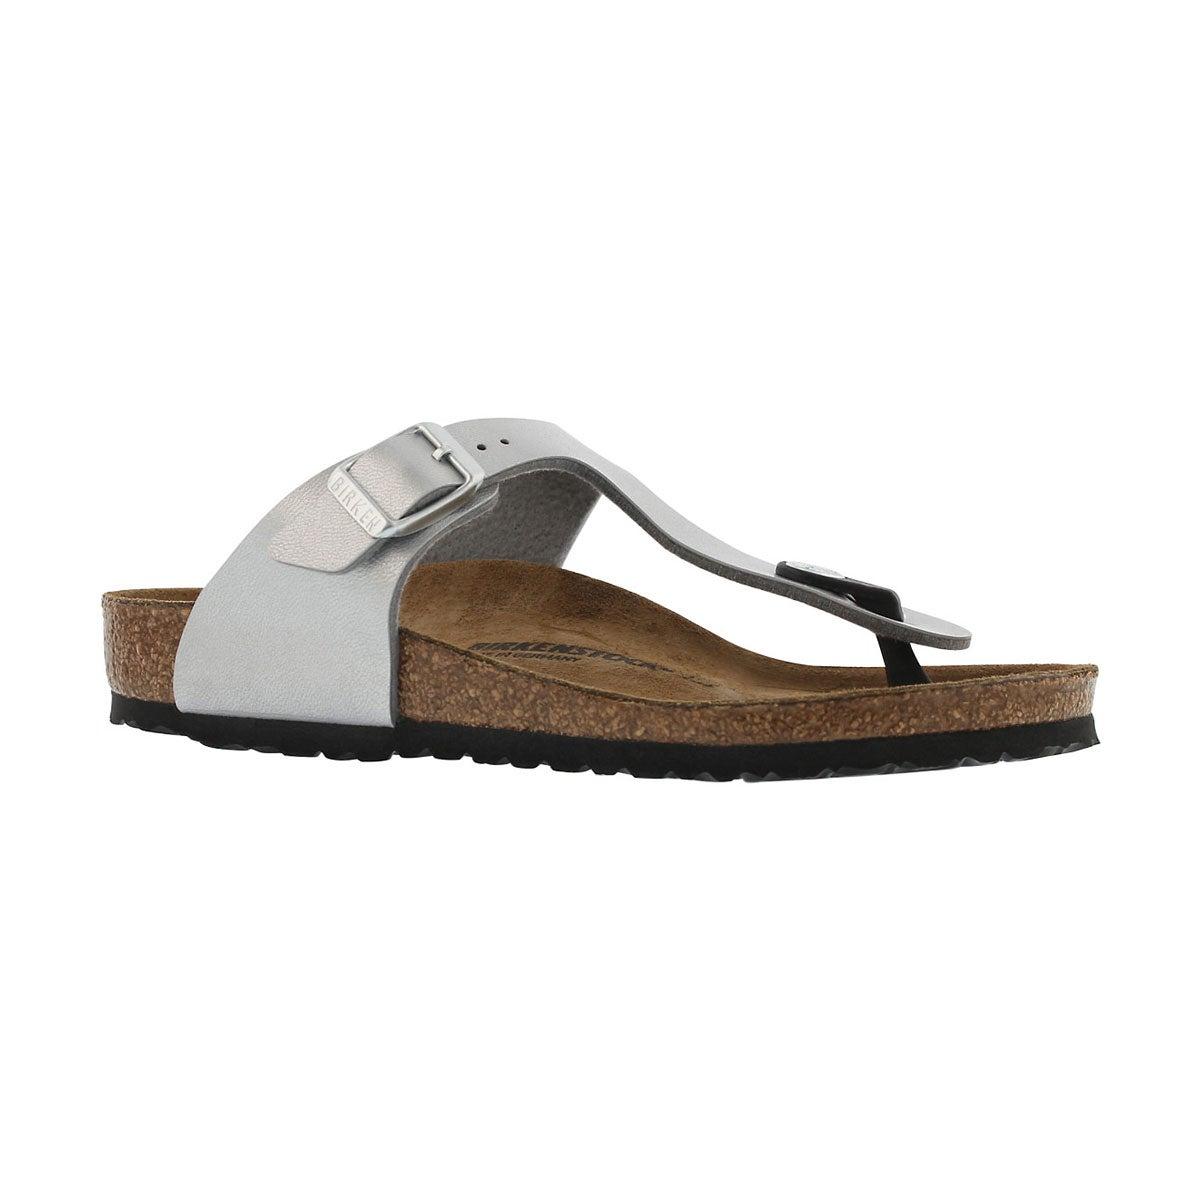 Girls' GIZEH silver thong cork narrow sandals